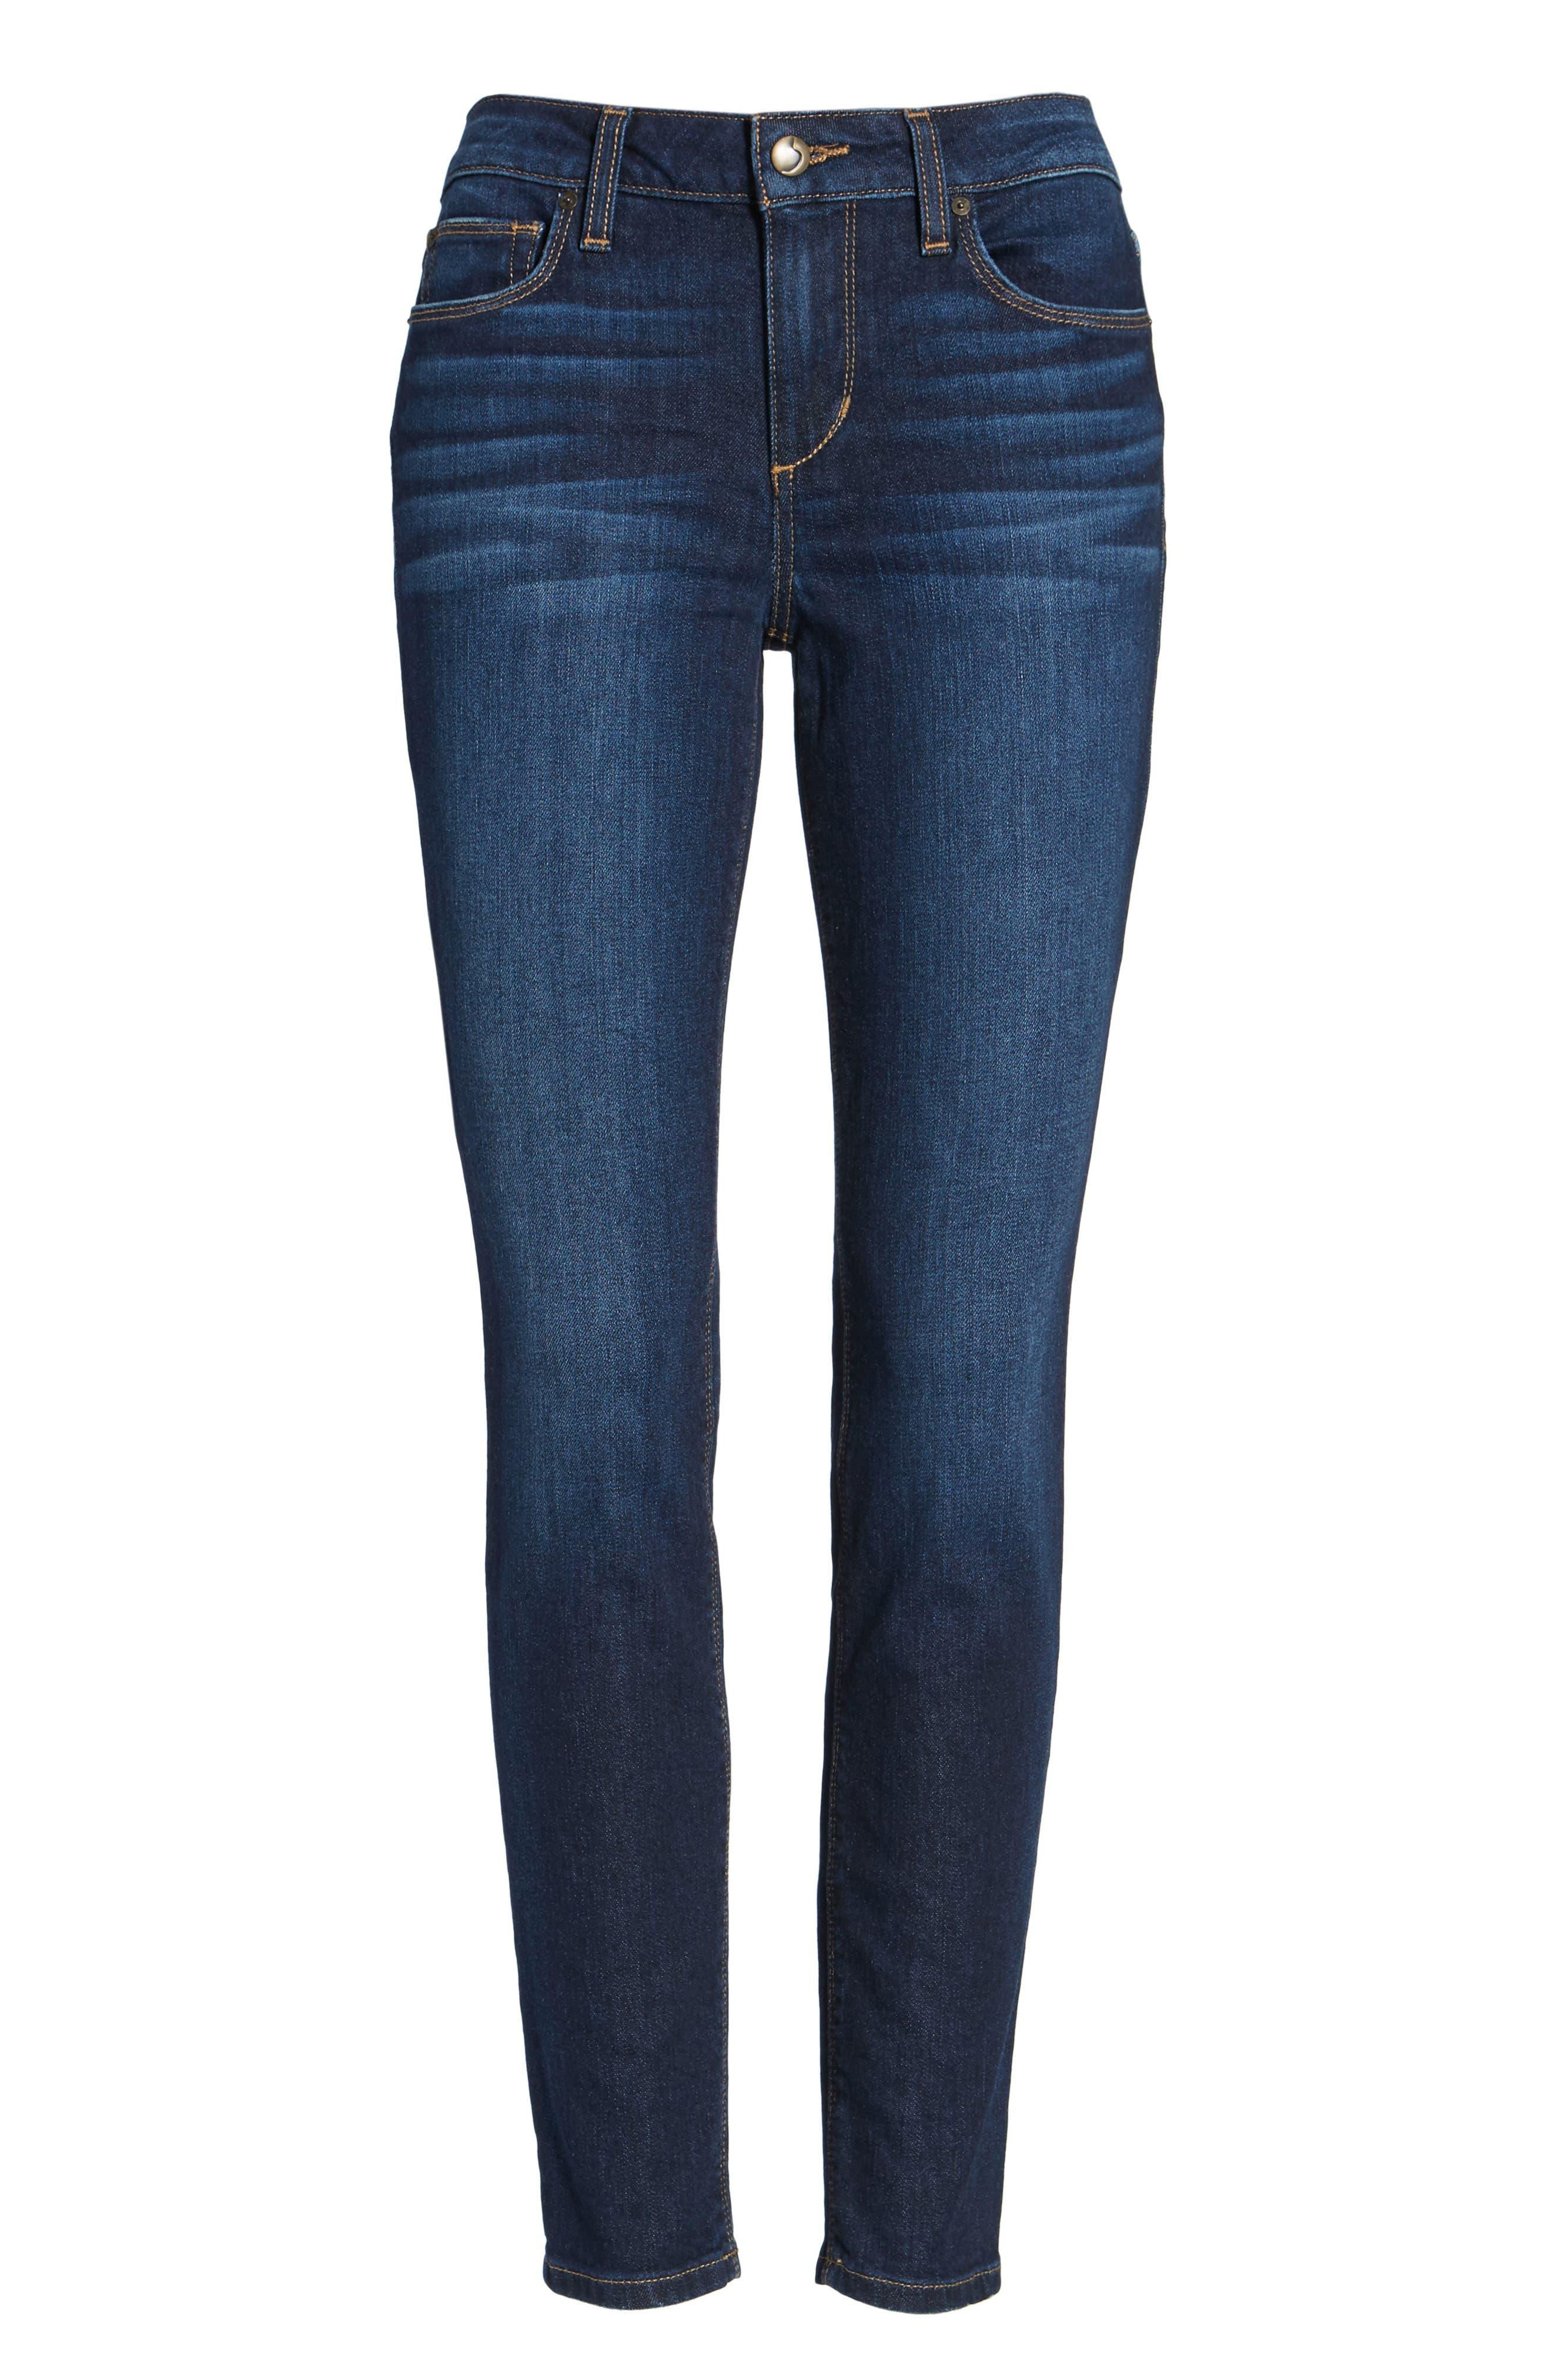 Icon Ankle Raw Hem Skinny Jeans,                             Alternate thumbnail 6, color,                             400